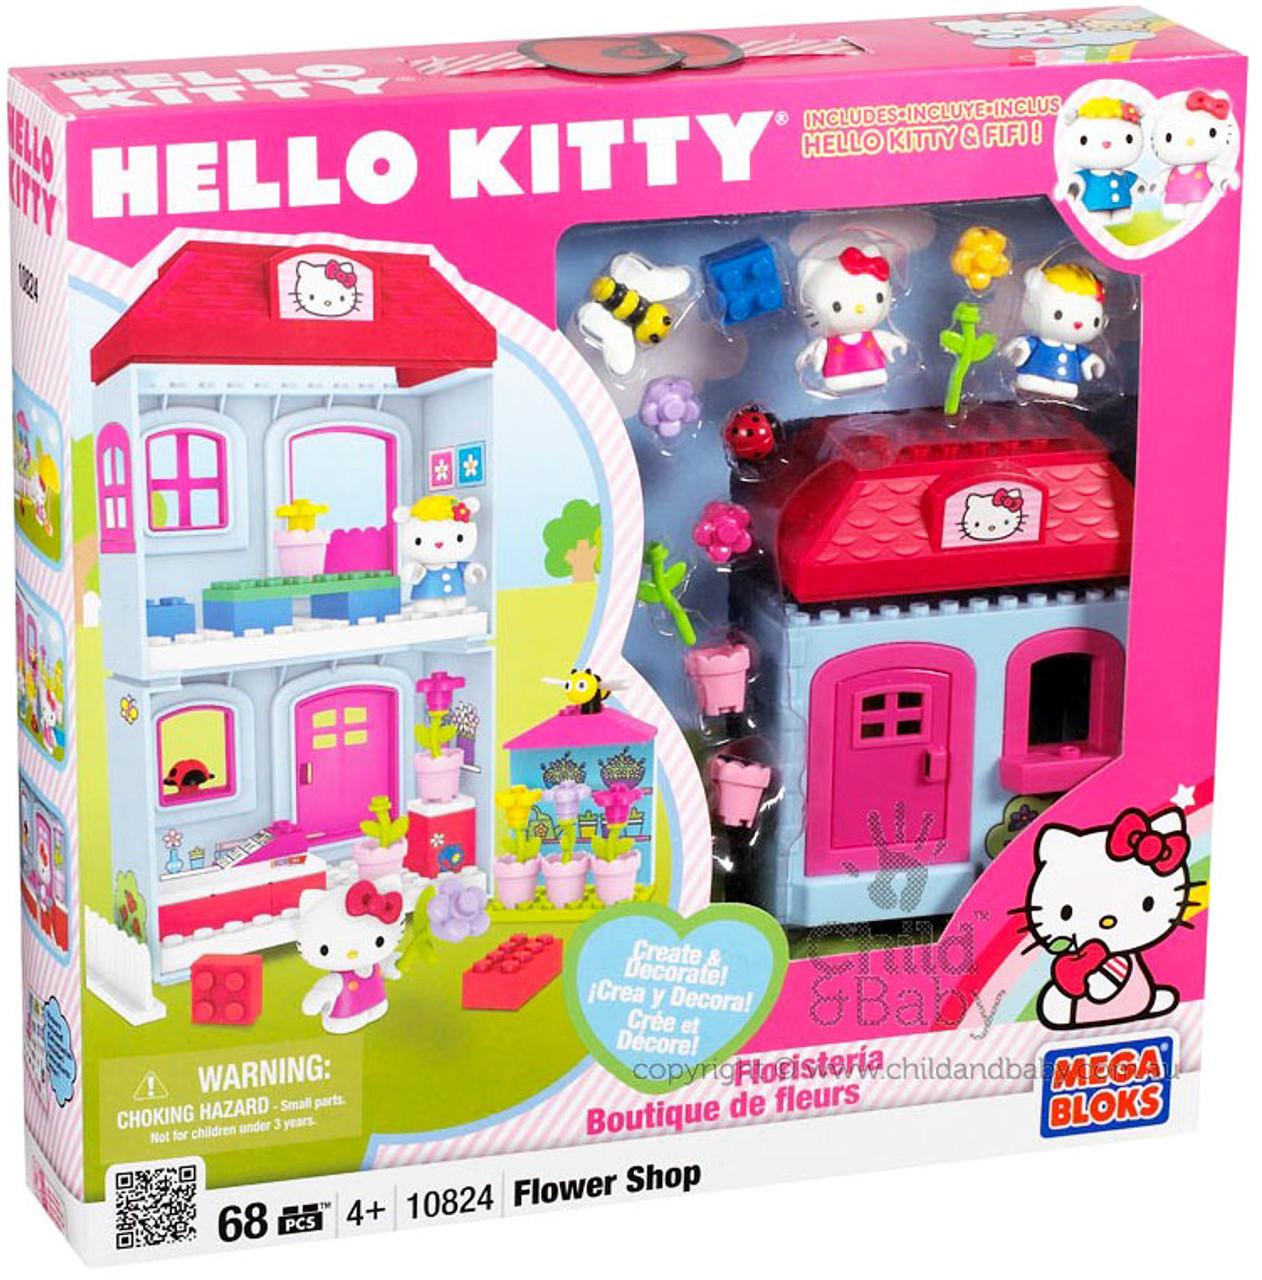 Mega Bloks Hello Kitty Create & Decorate Flower Shop Set #10824